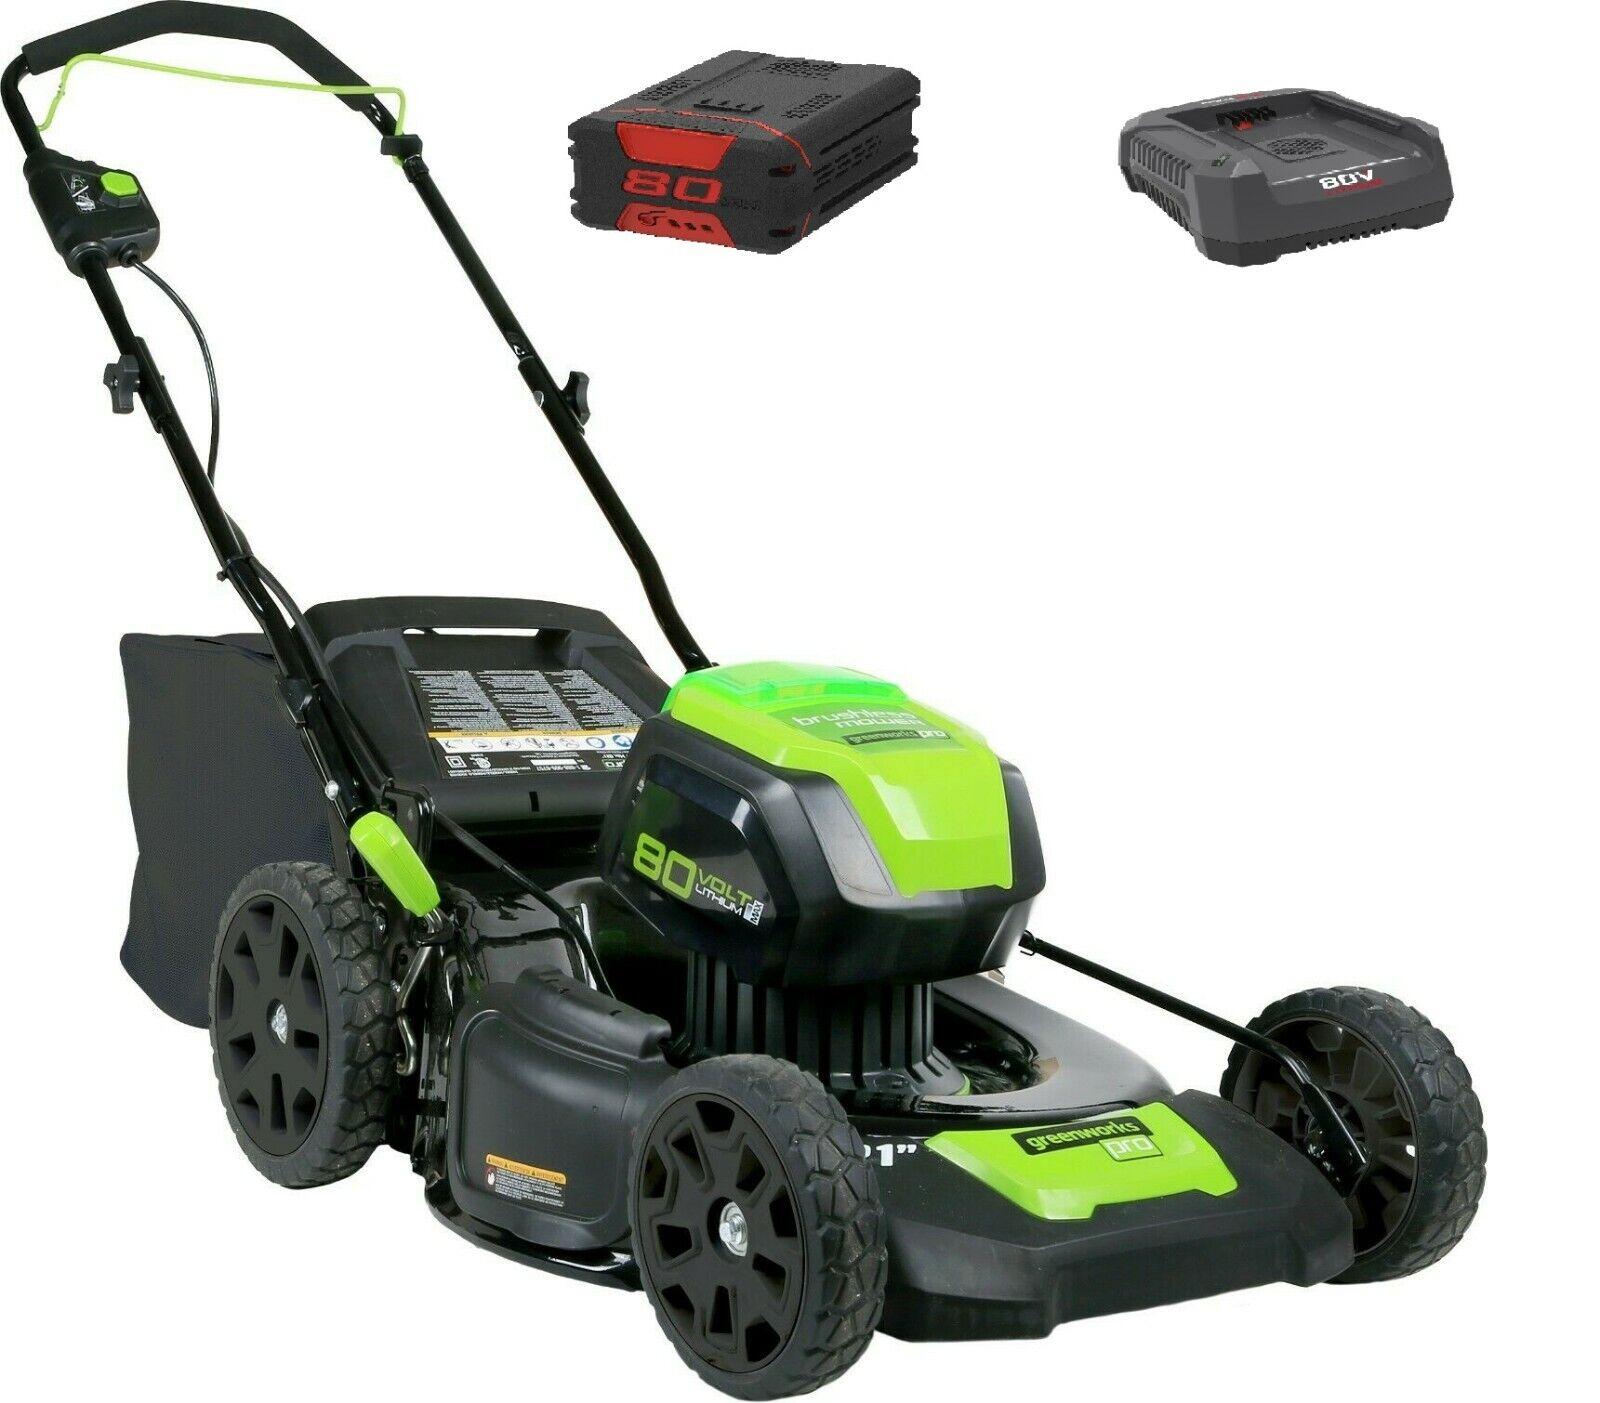 Greenworks 2500707 80V Pro GD80LM53 DigiPro Akku Rasenmäher 1x Akku 1x Ladegerät